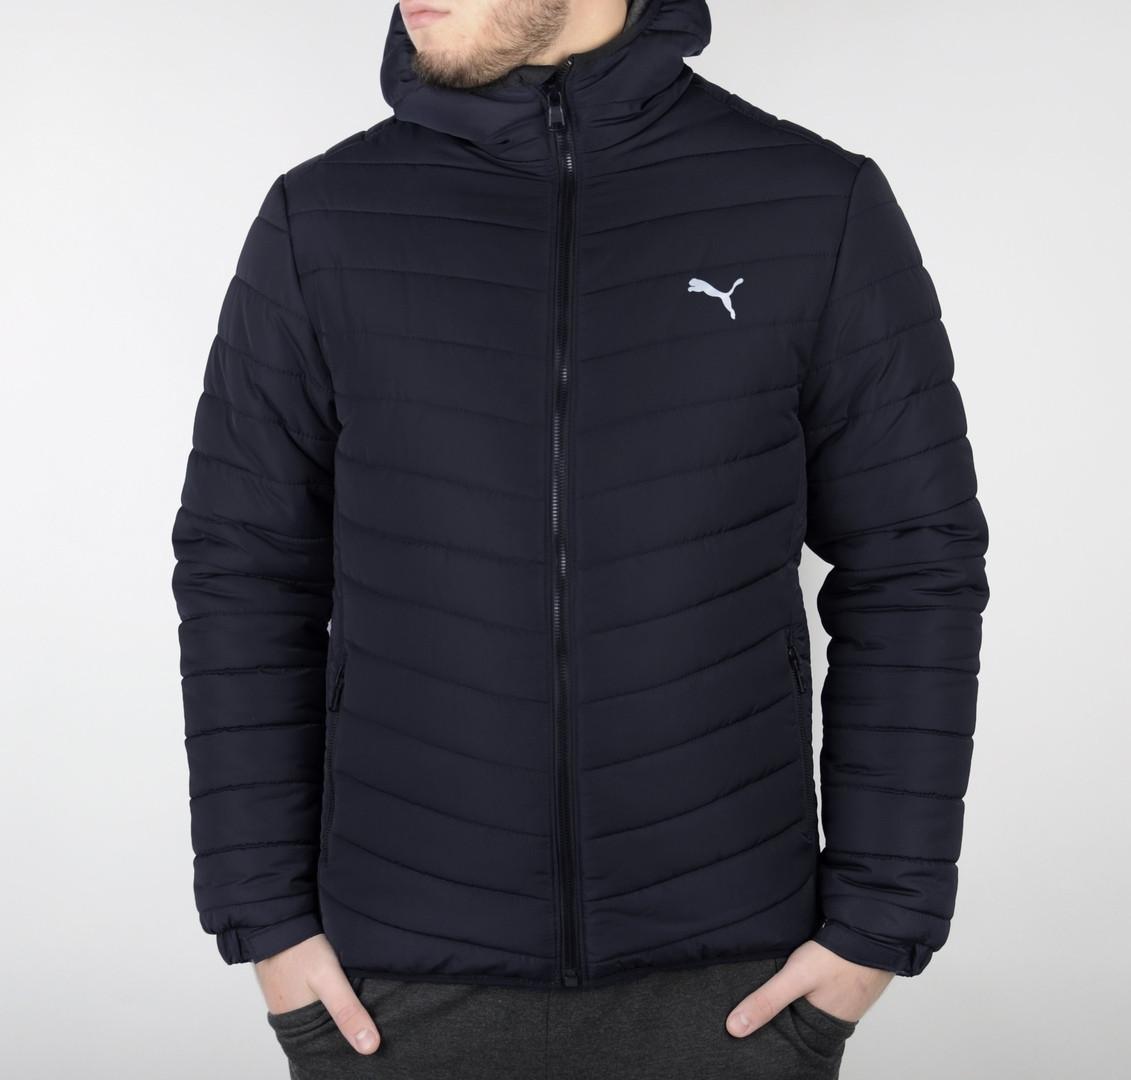 Куртка Puma зимняя (пума) для мужчин